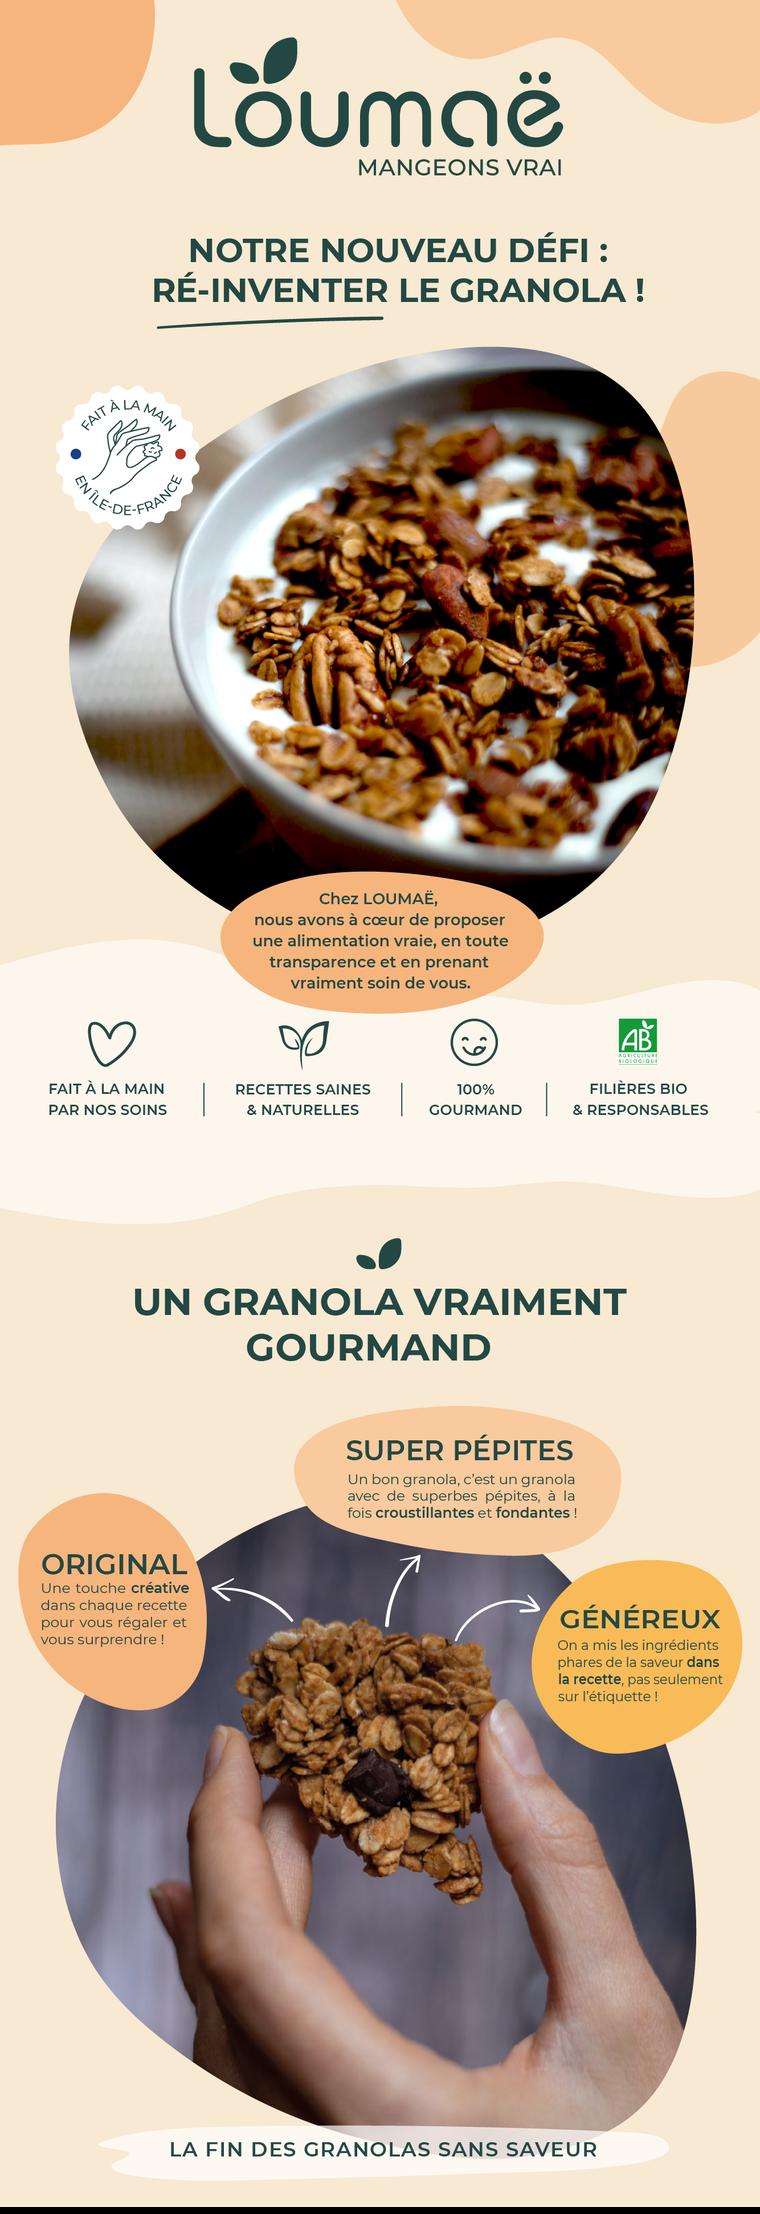 3245571dbce7580579e10f28cddd73de - Le Granola Super Pépites de Loumaë